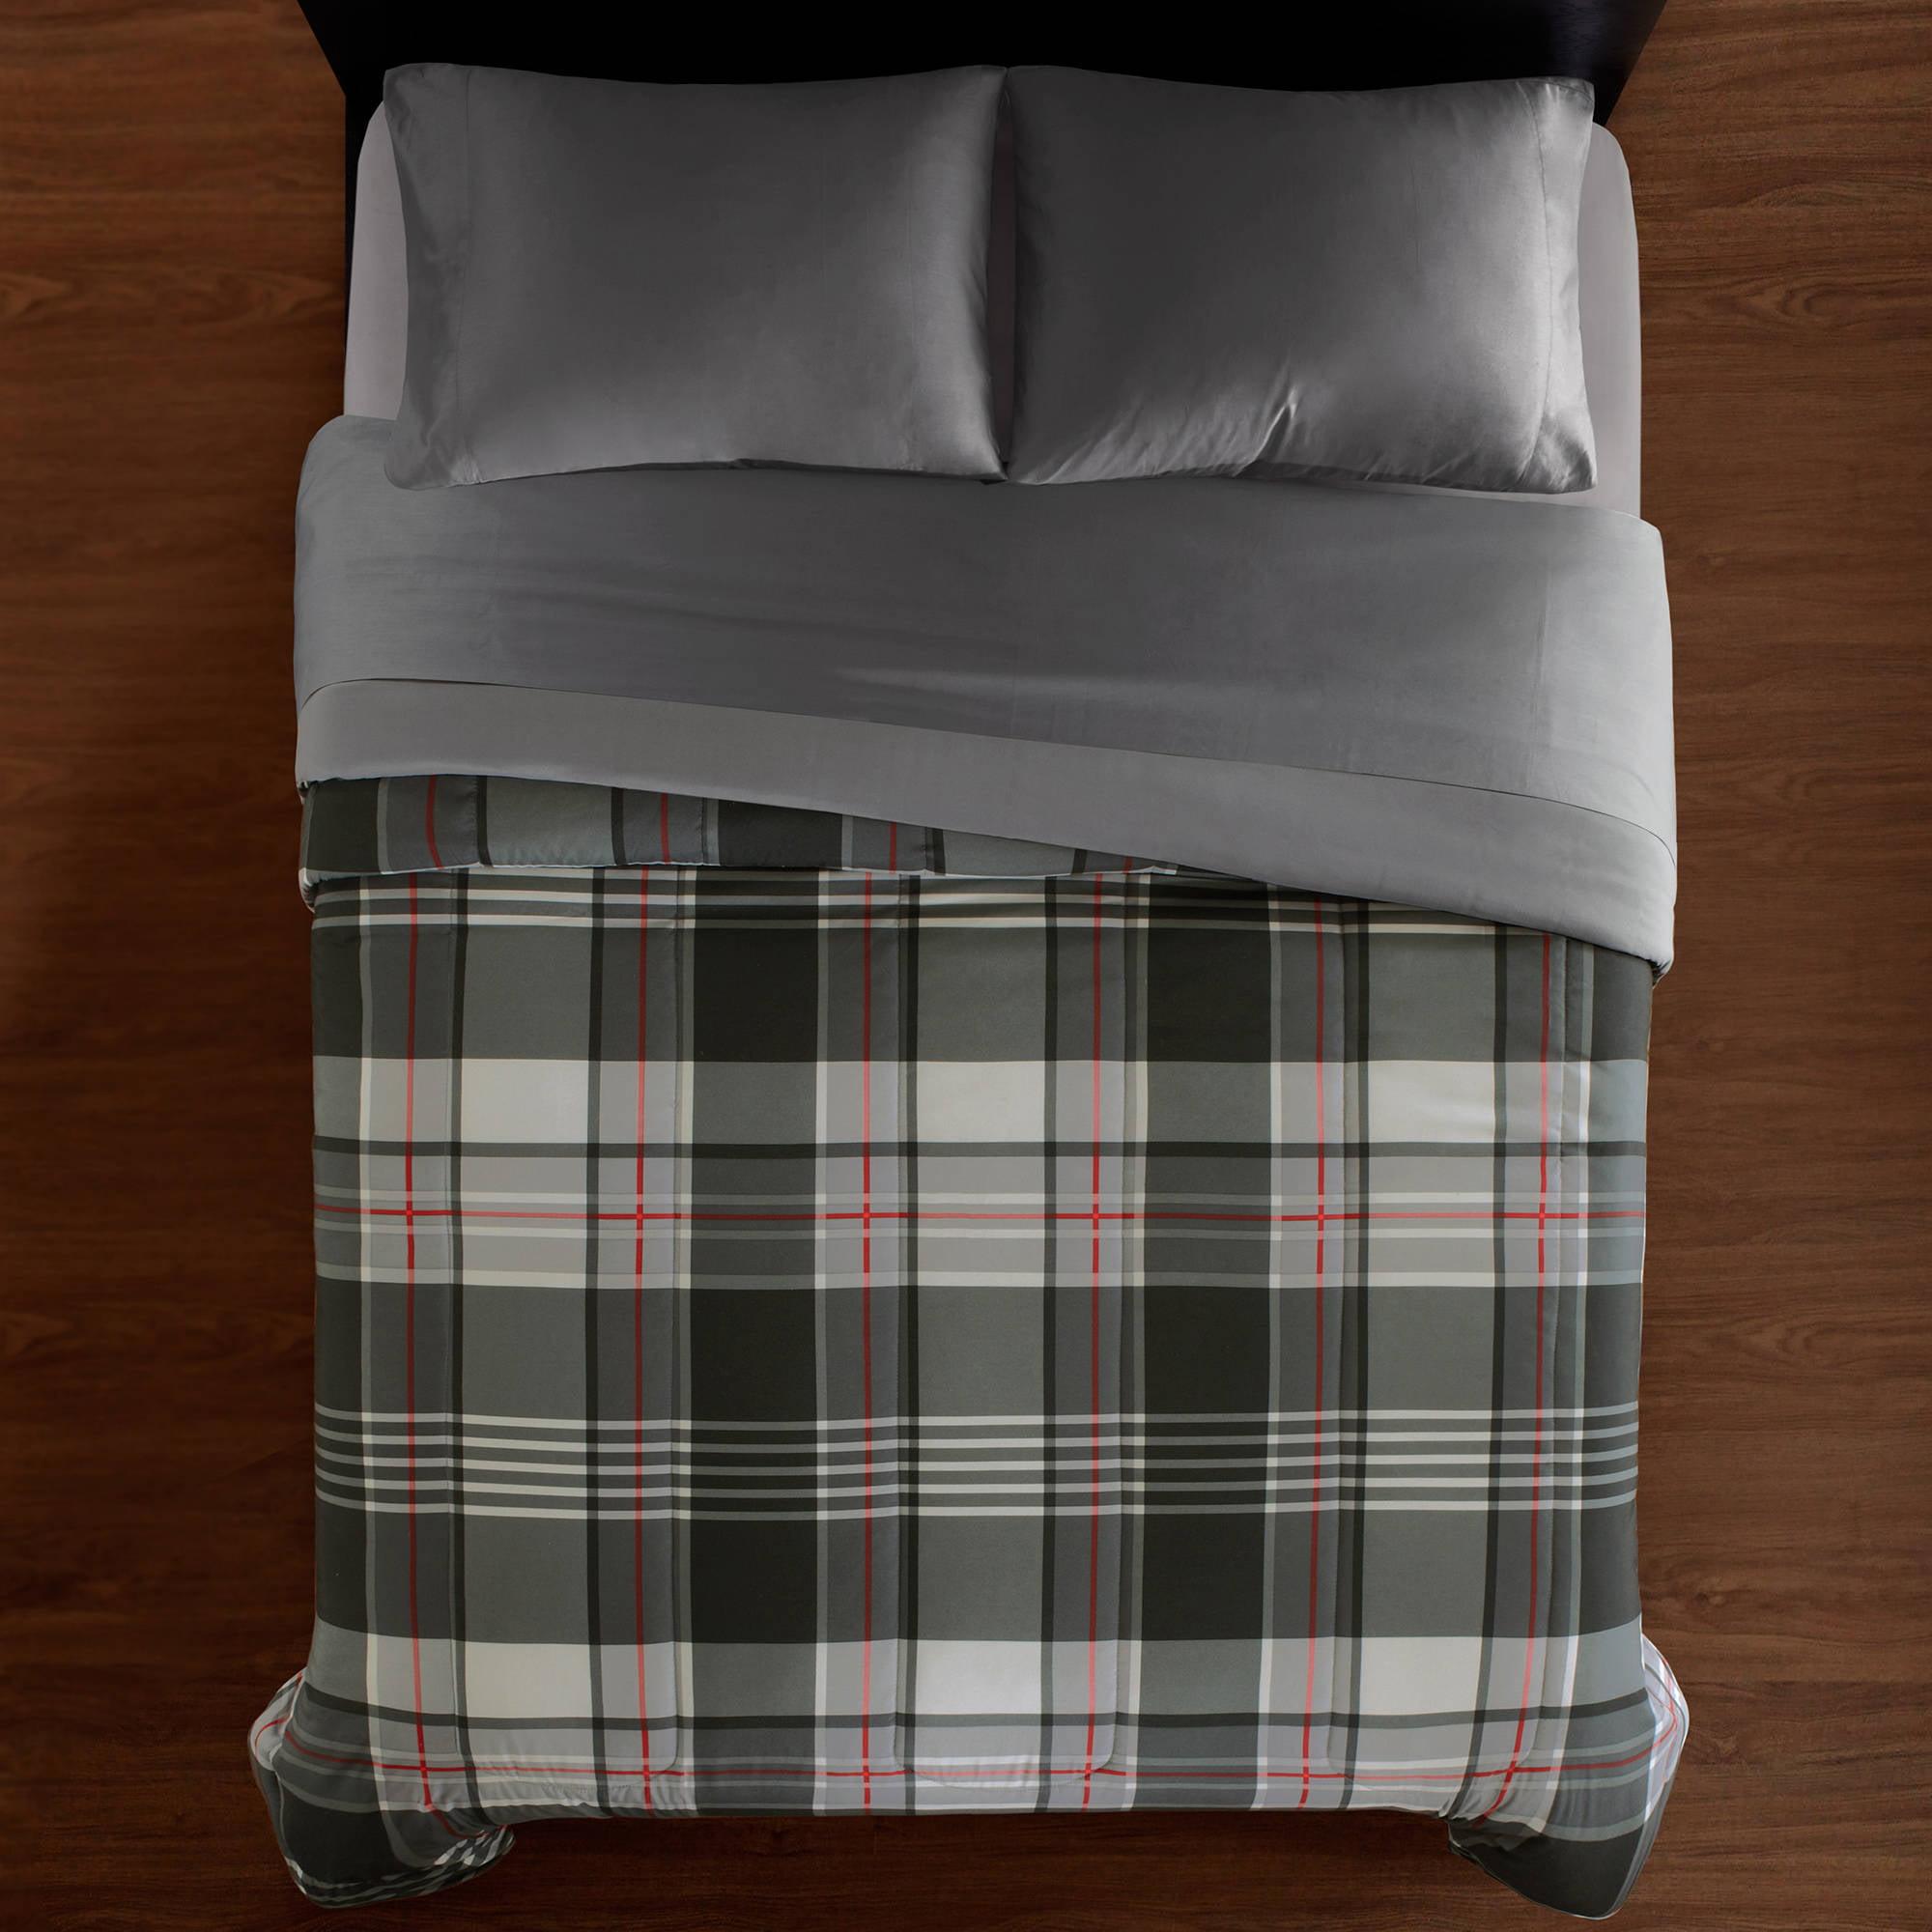 Mainstays Gray Plaid Soft Microfiber Reversible Comforter